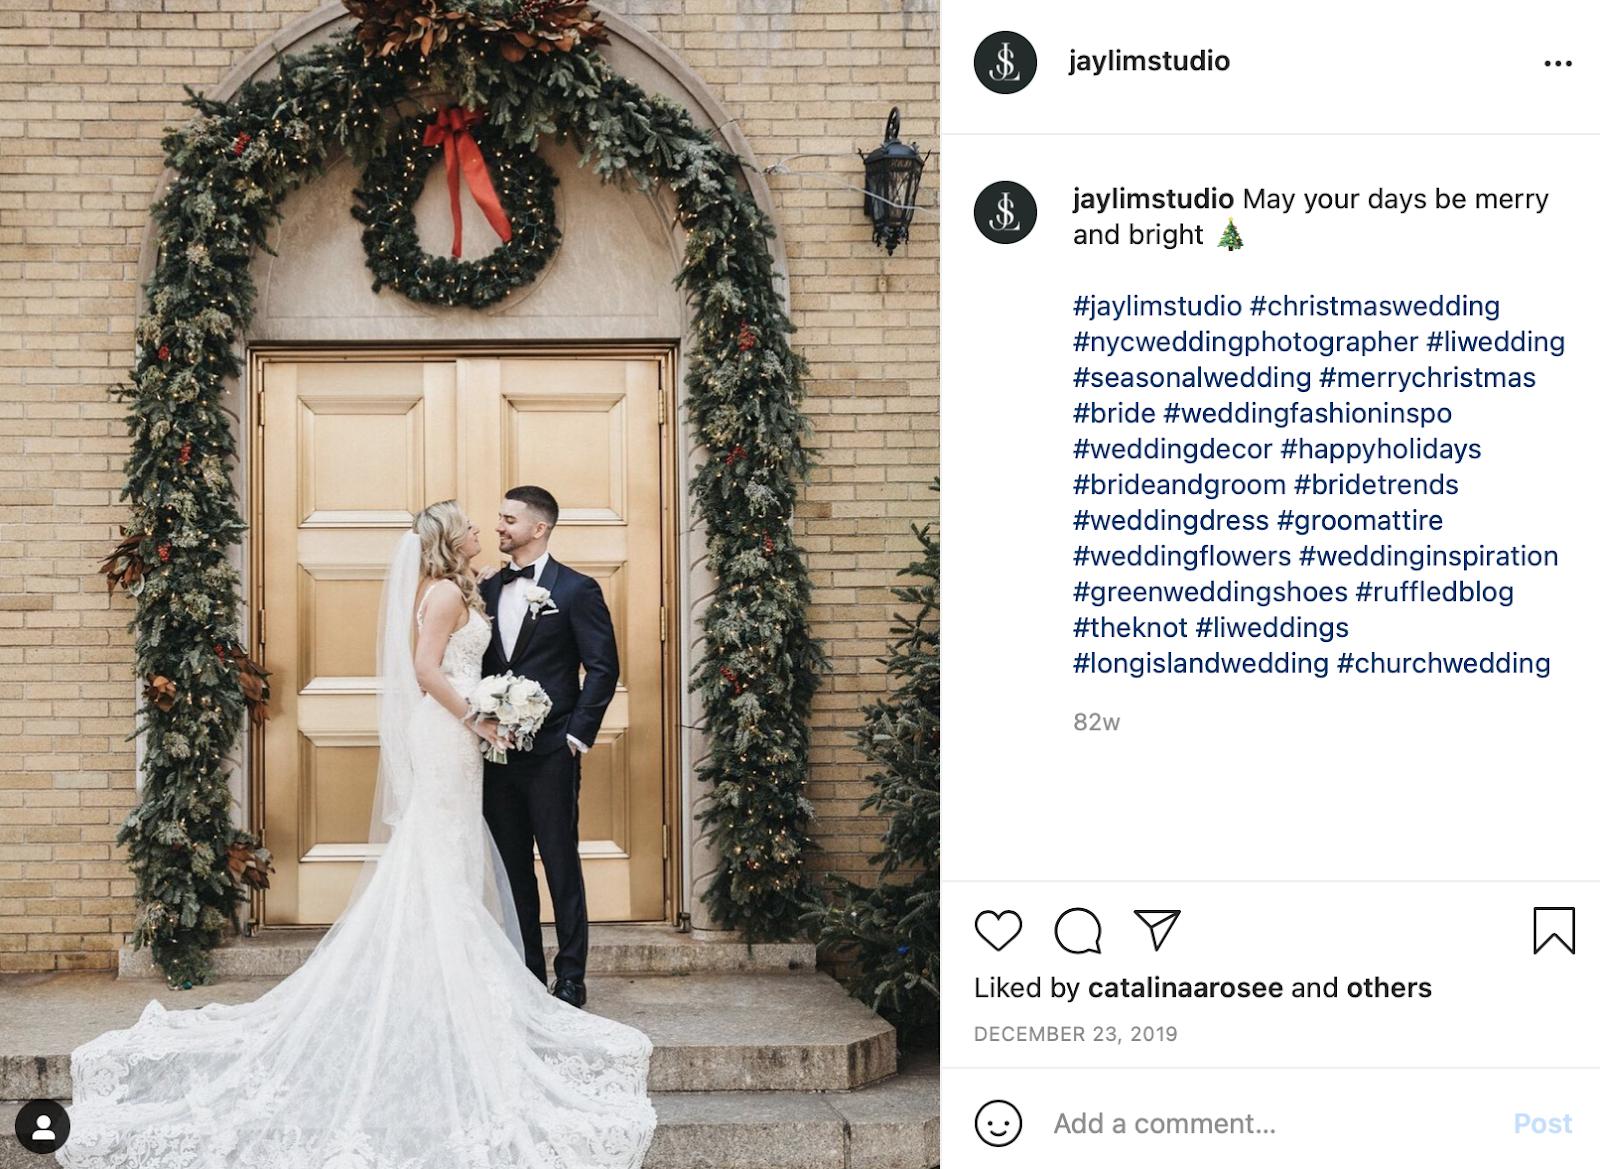 holiday wedding celebration Instagram photo